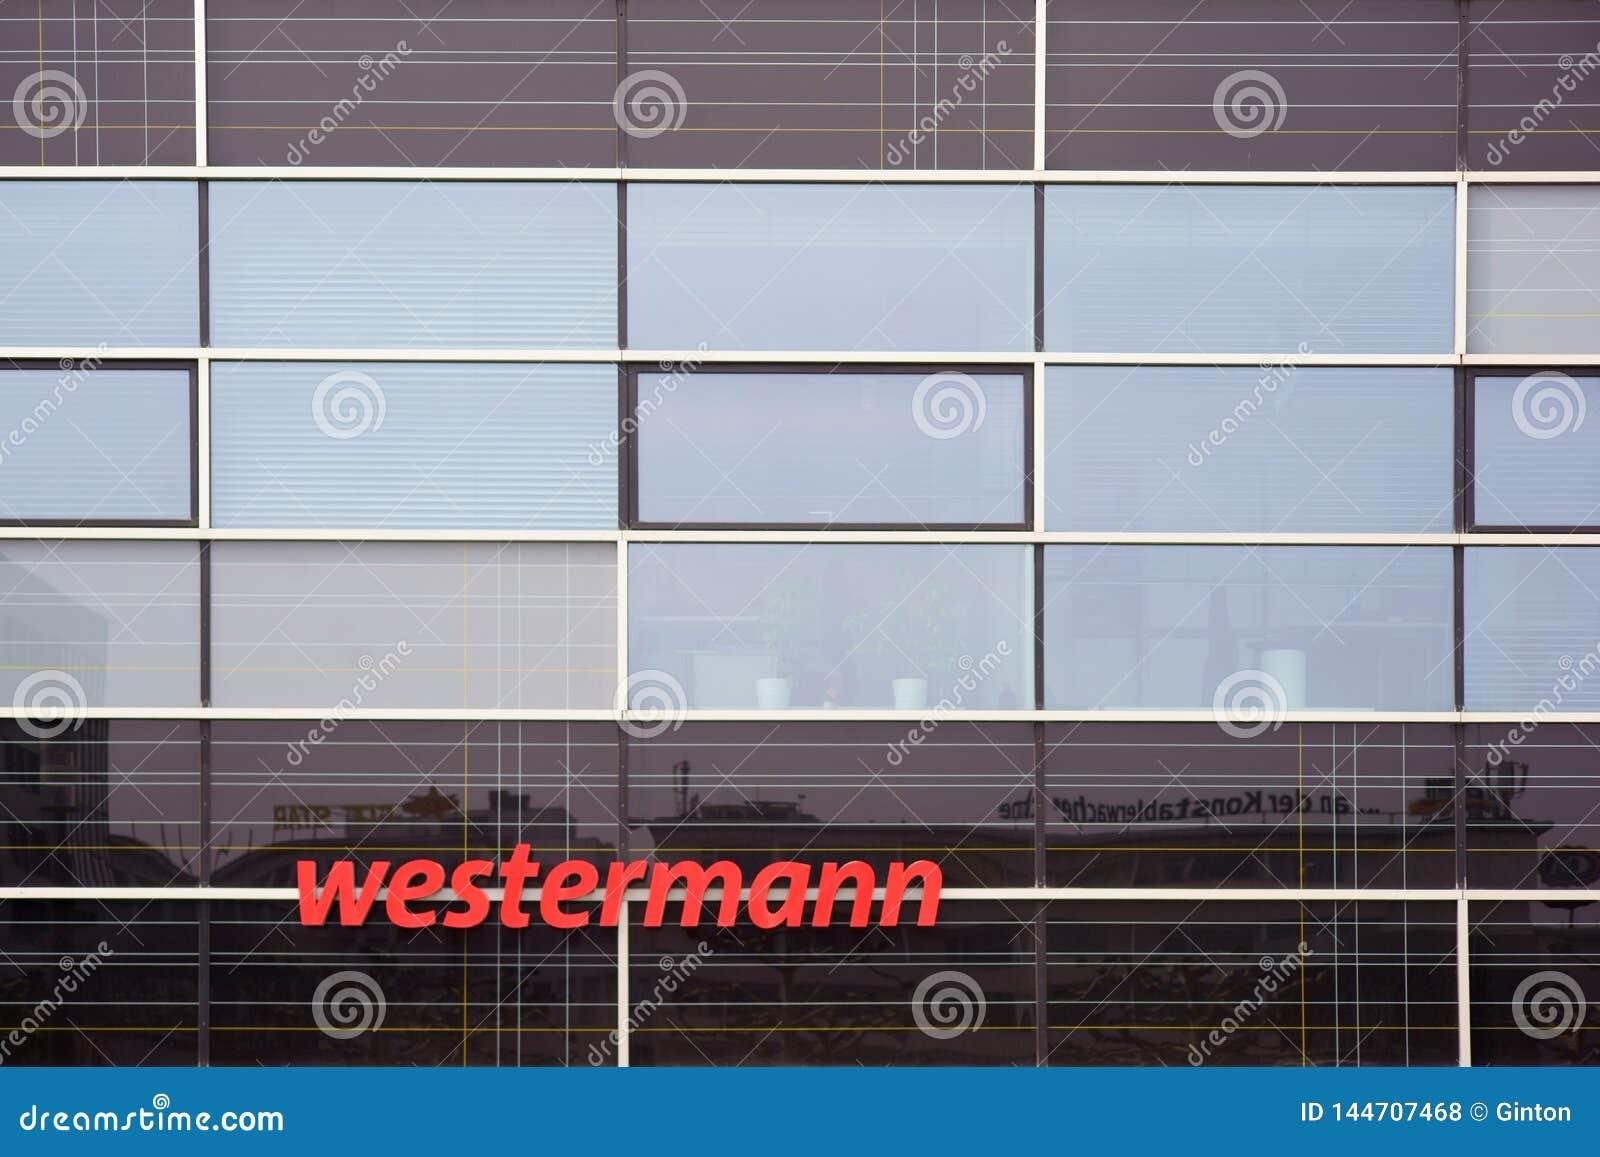 Westermann Frankfurt